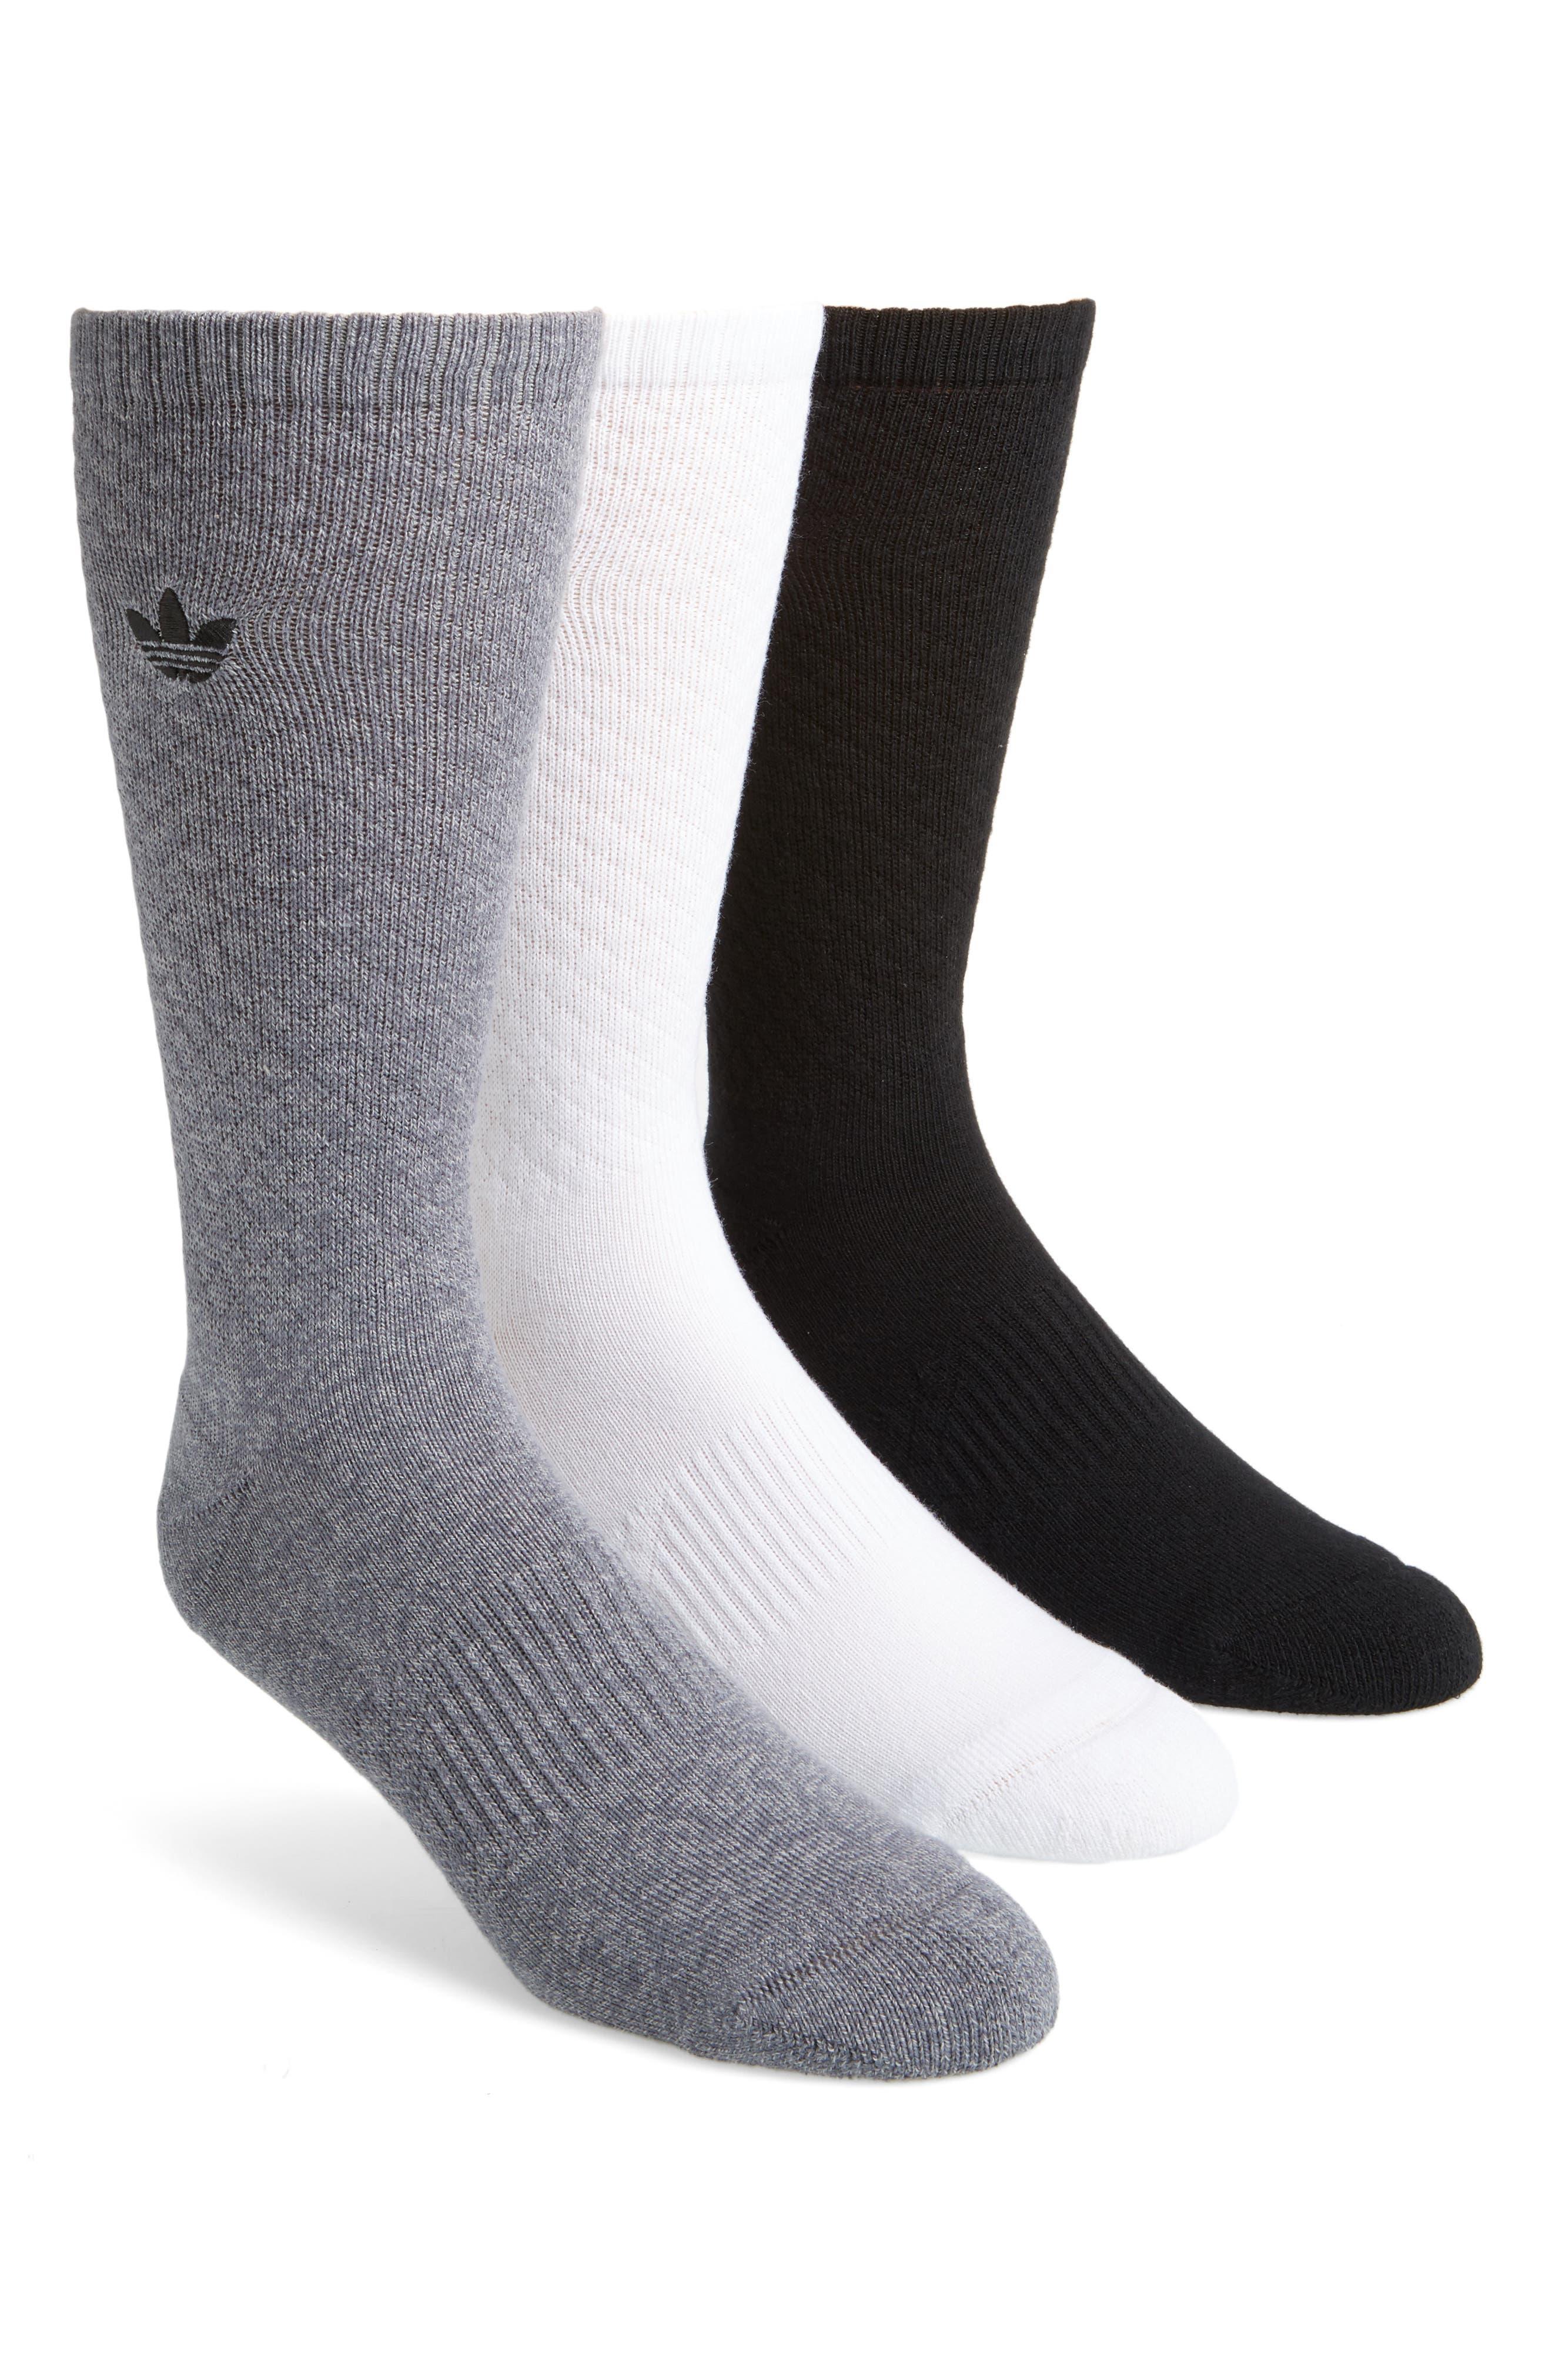 Alternate Image 1 Selected - adidas Originals 3-Pack Quilted Socks